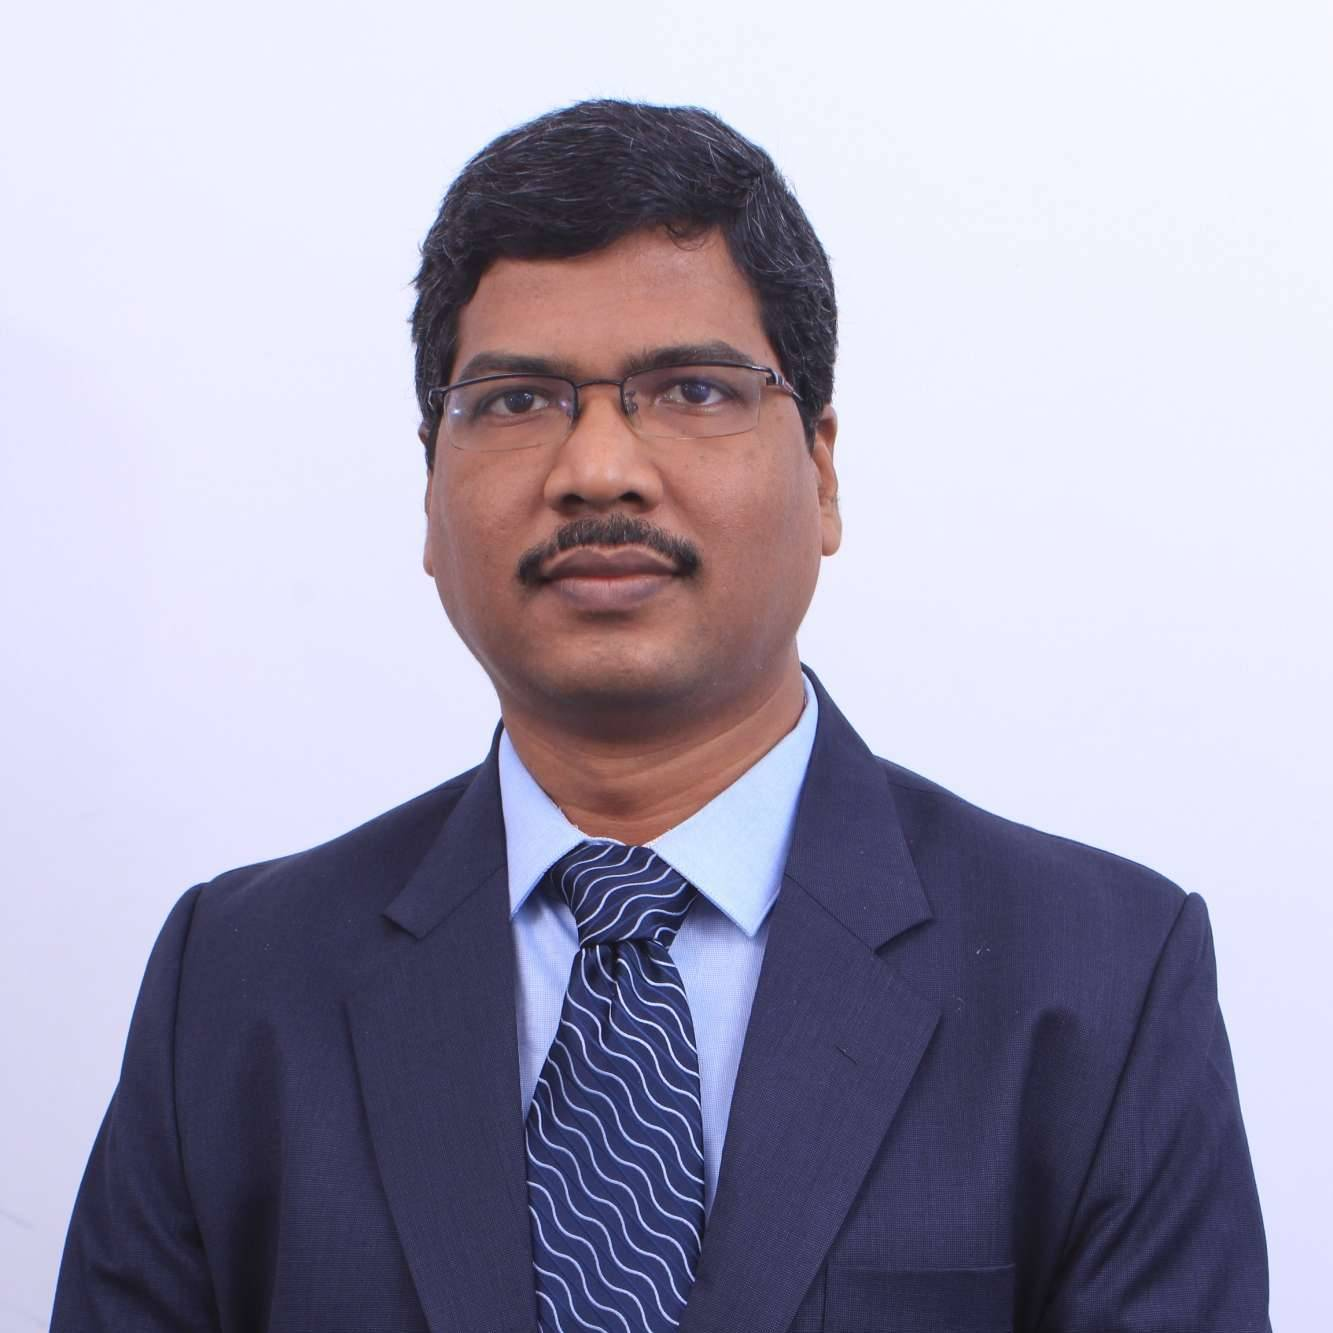 Dr. Gautam Dethe